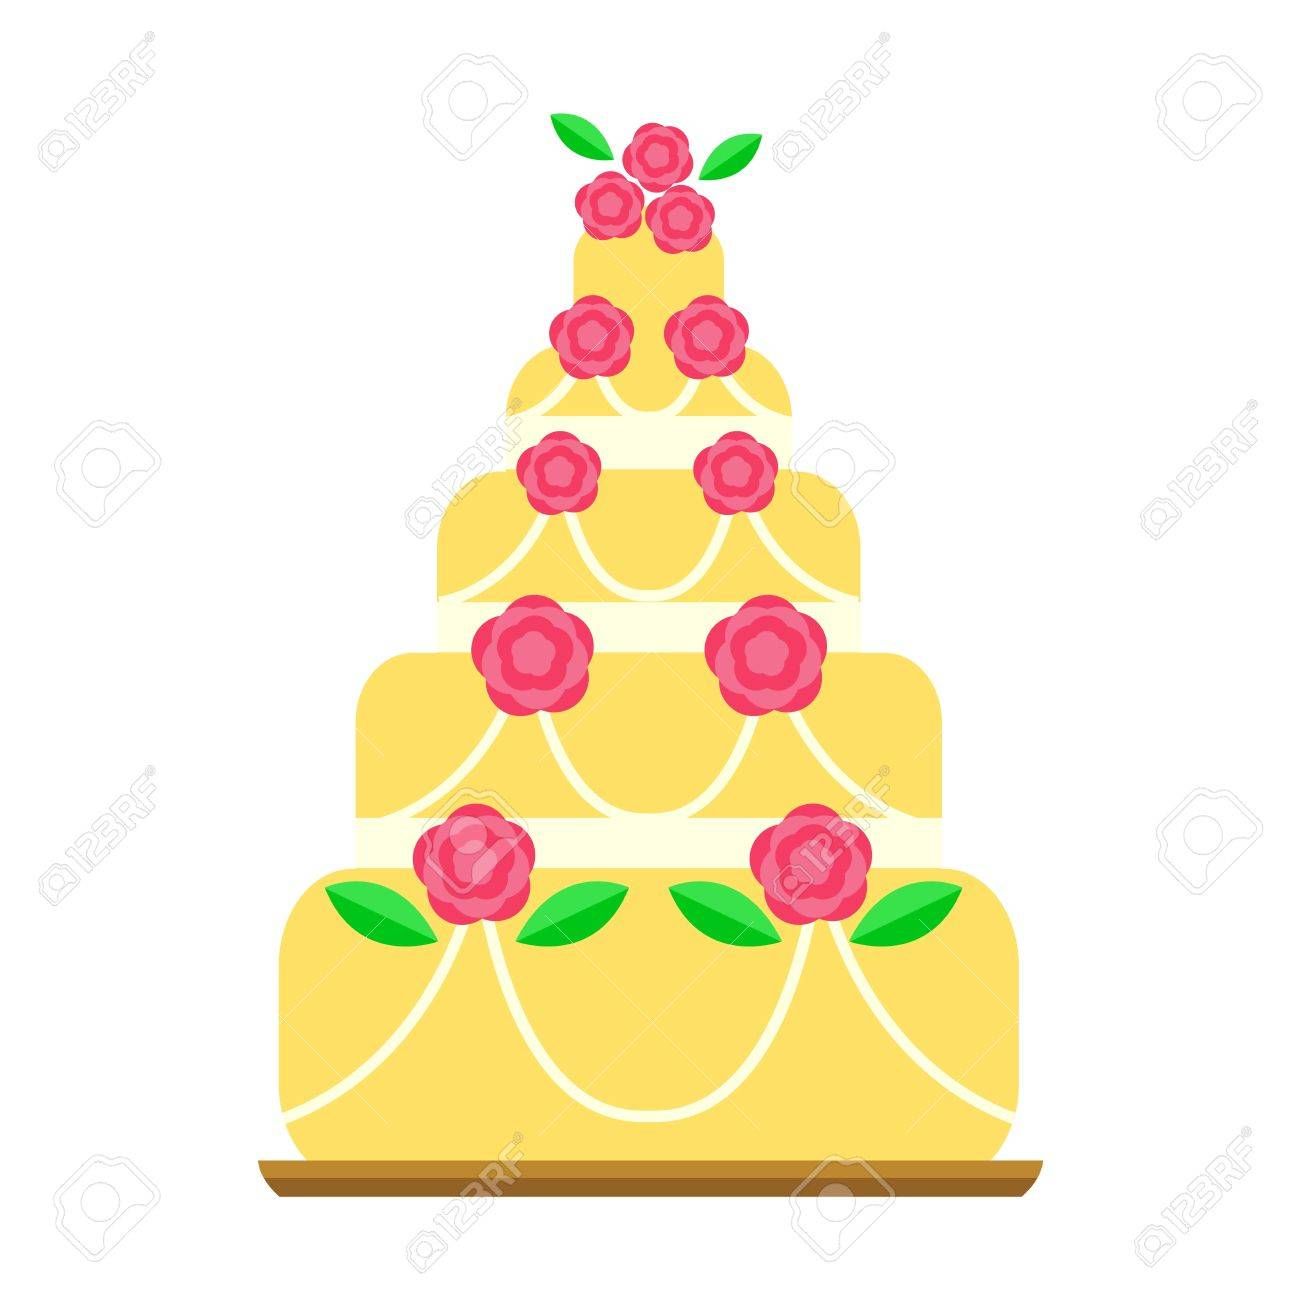 Pie For Birthday Isolated Cake Vector. Wedding Or Birthday Cake ...